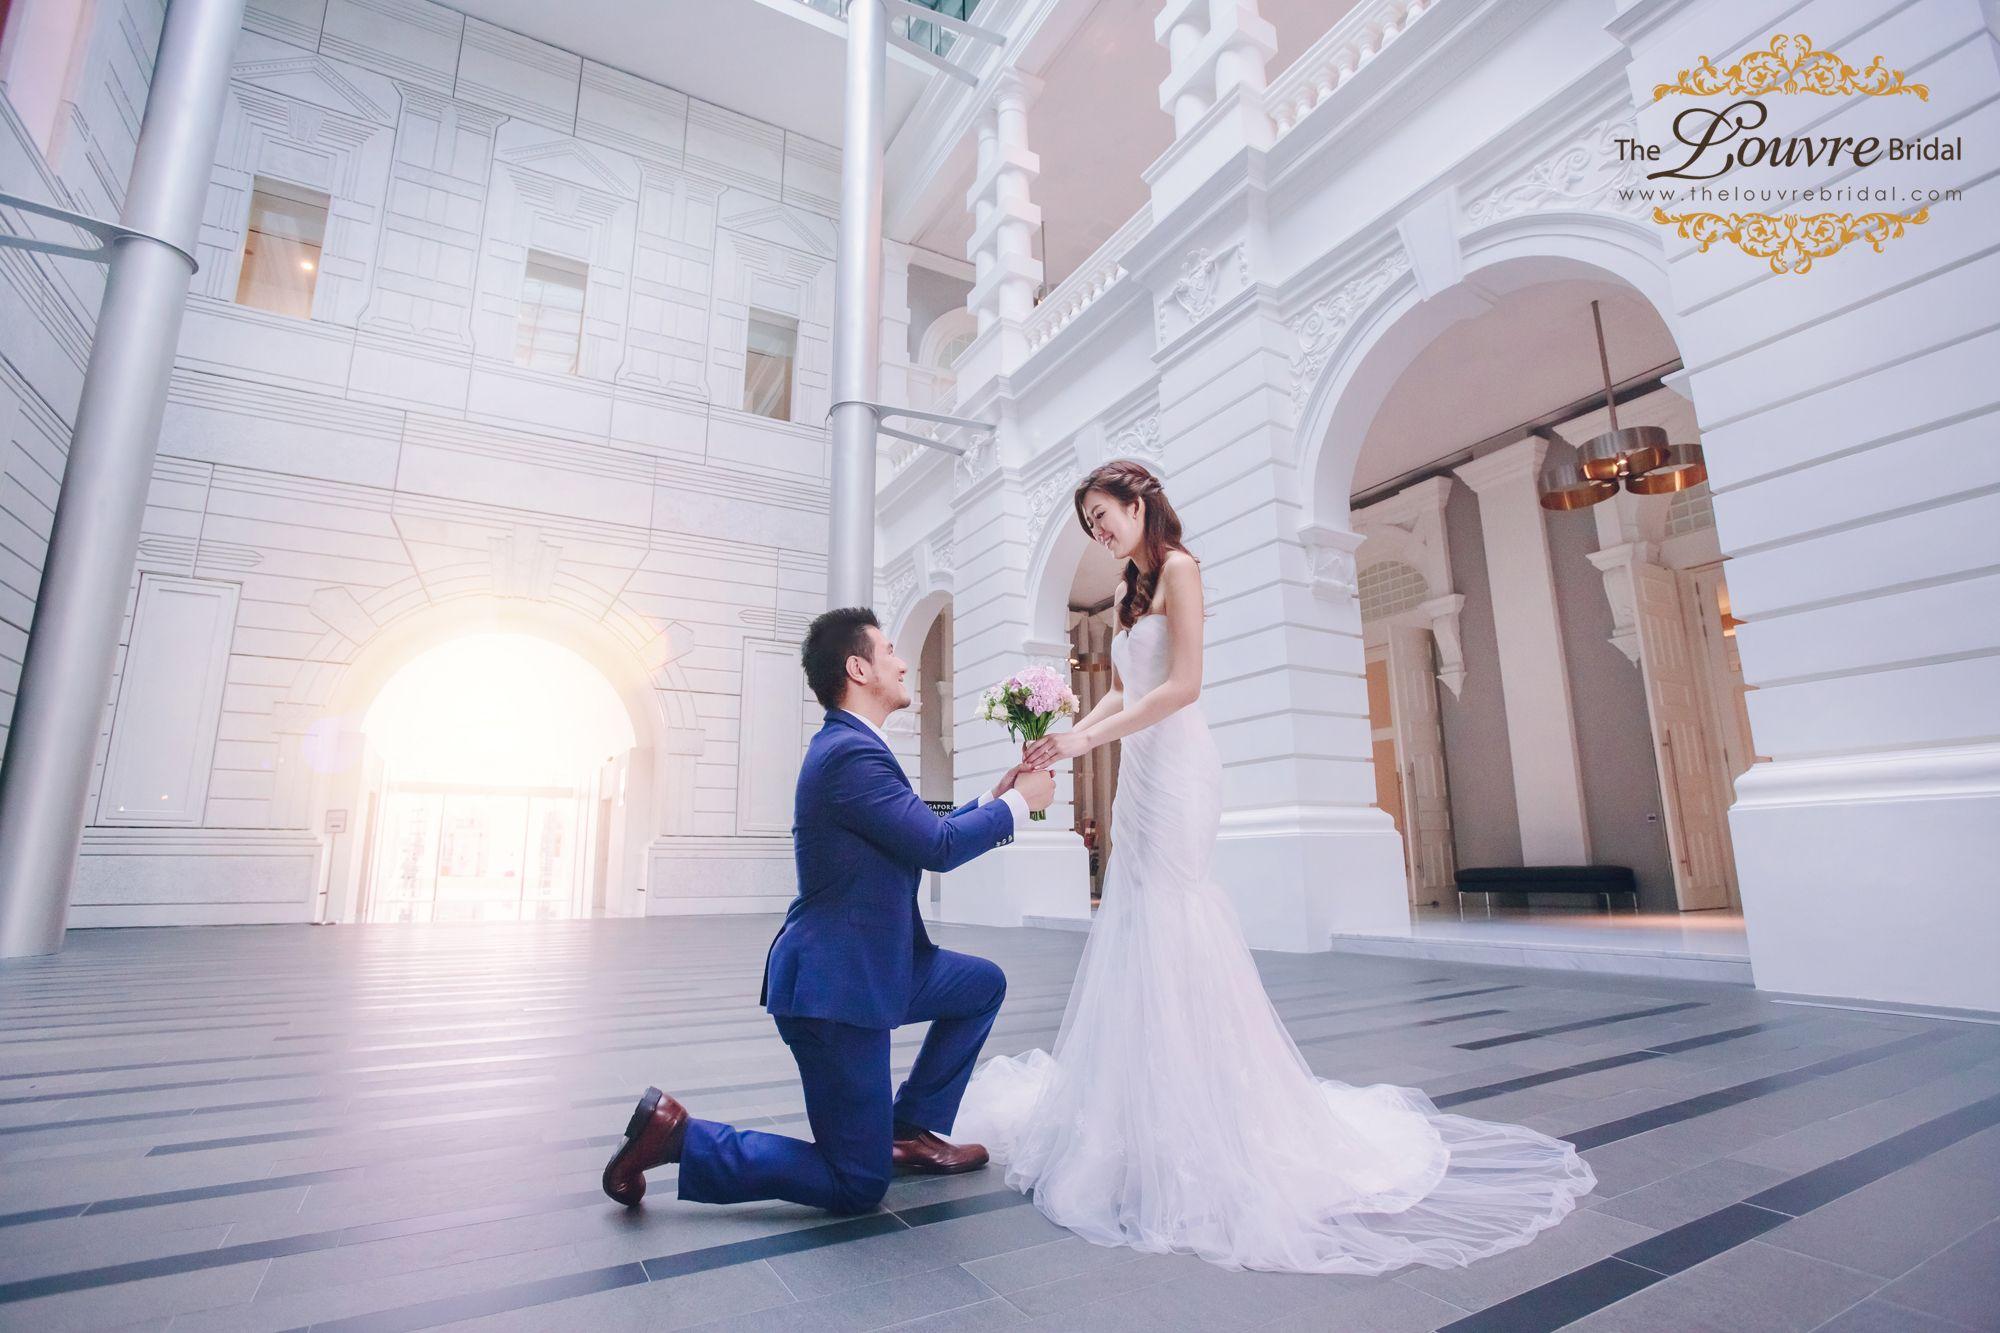 Cheap wedding photography singapore Bridal Boutique Singapore: Cheap Wedding Bridal Package